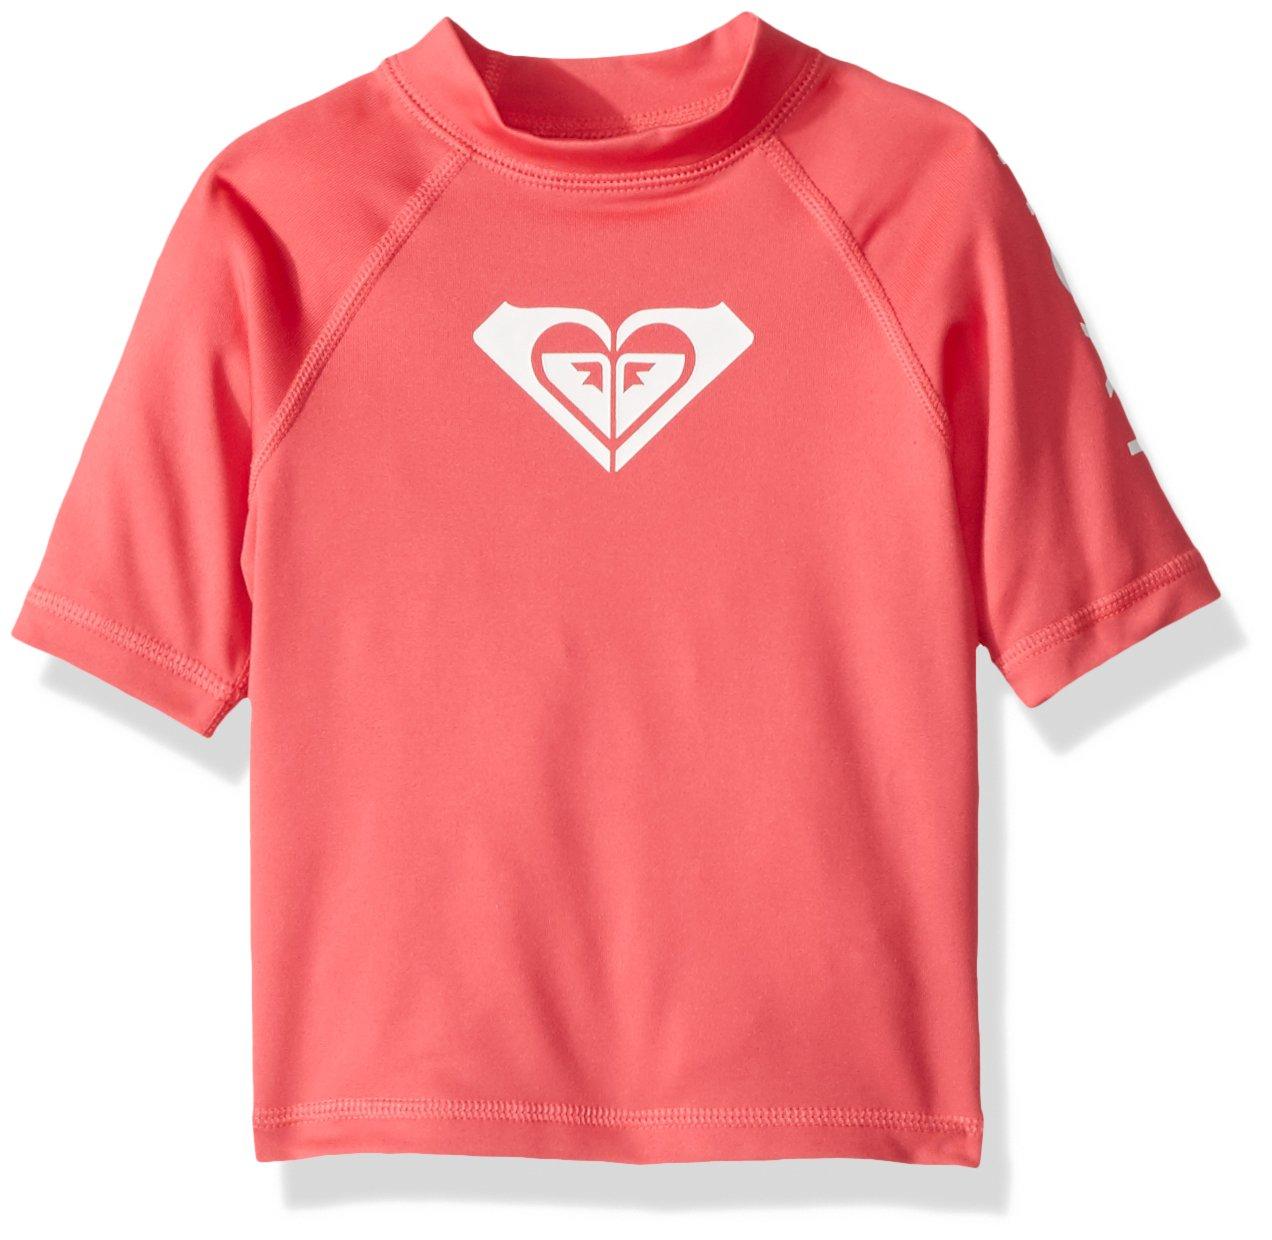 Roxy Toddler Girls' Whole Hearted Short Sleeve Rashguard, Rouge red, 2